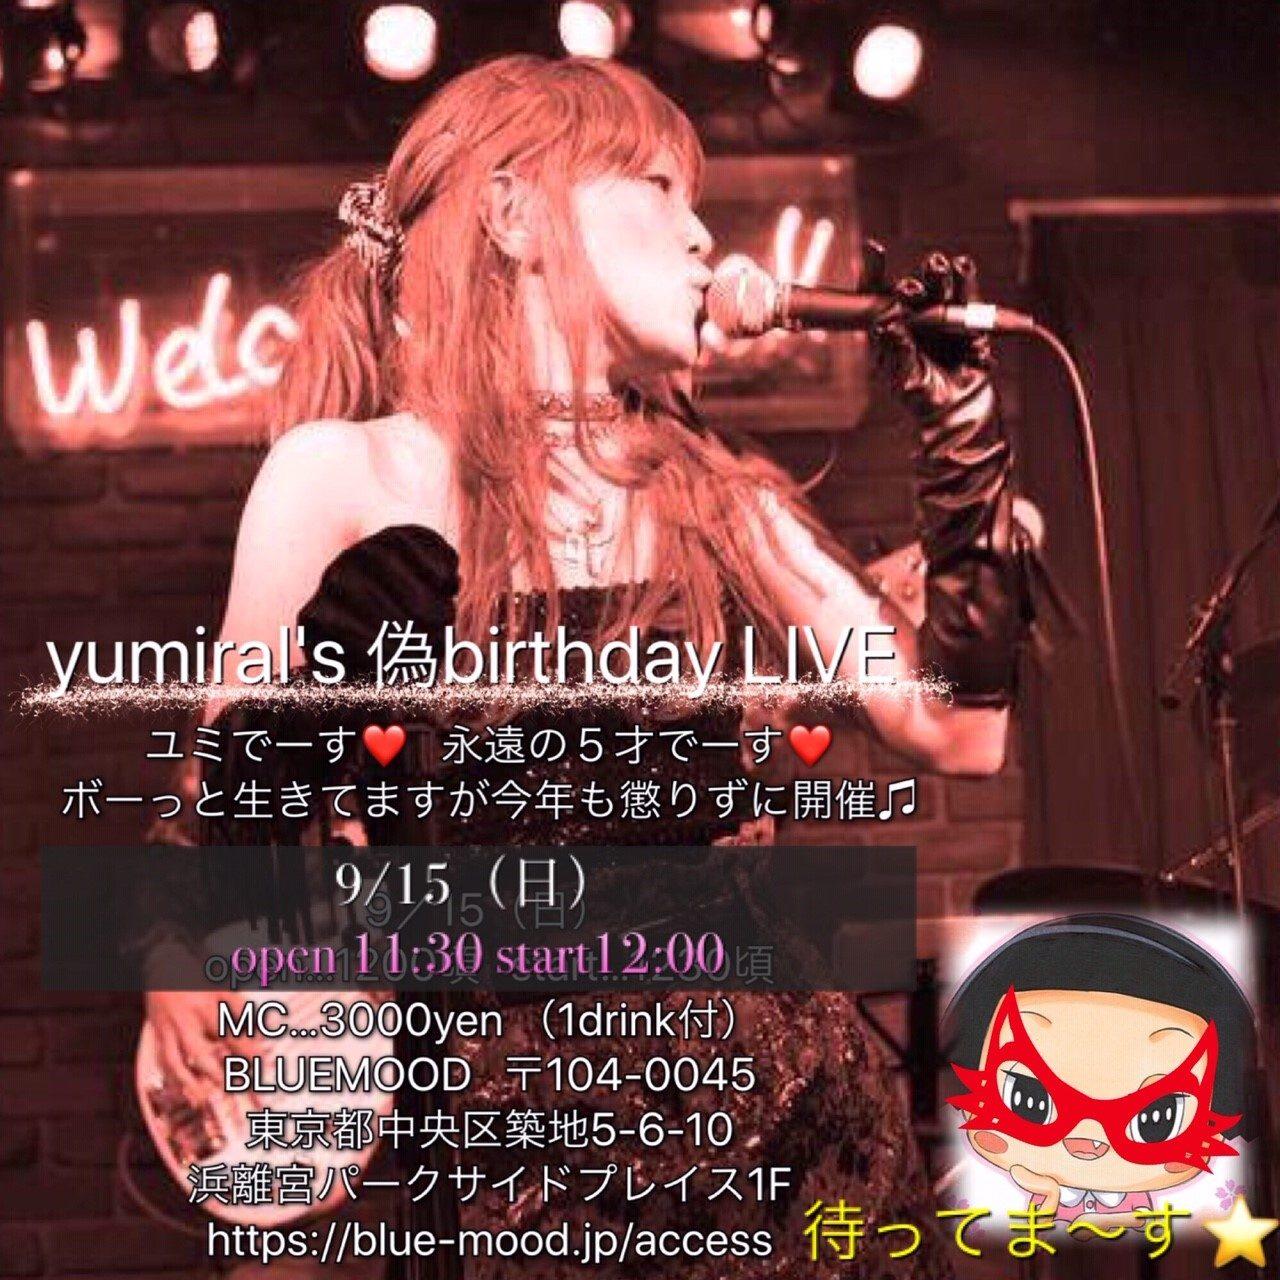 yumiral's 偽buirthday LIVE